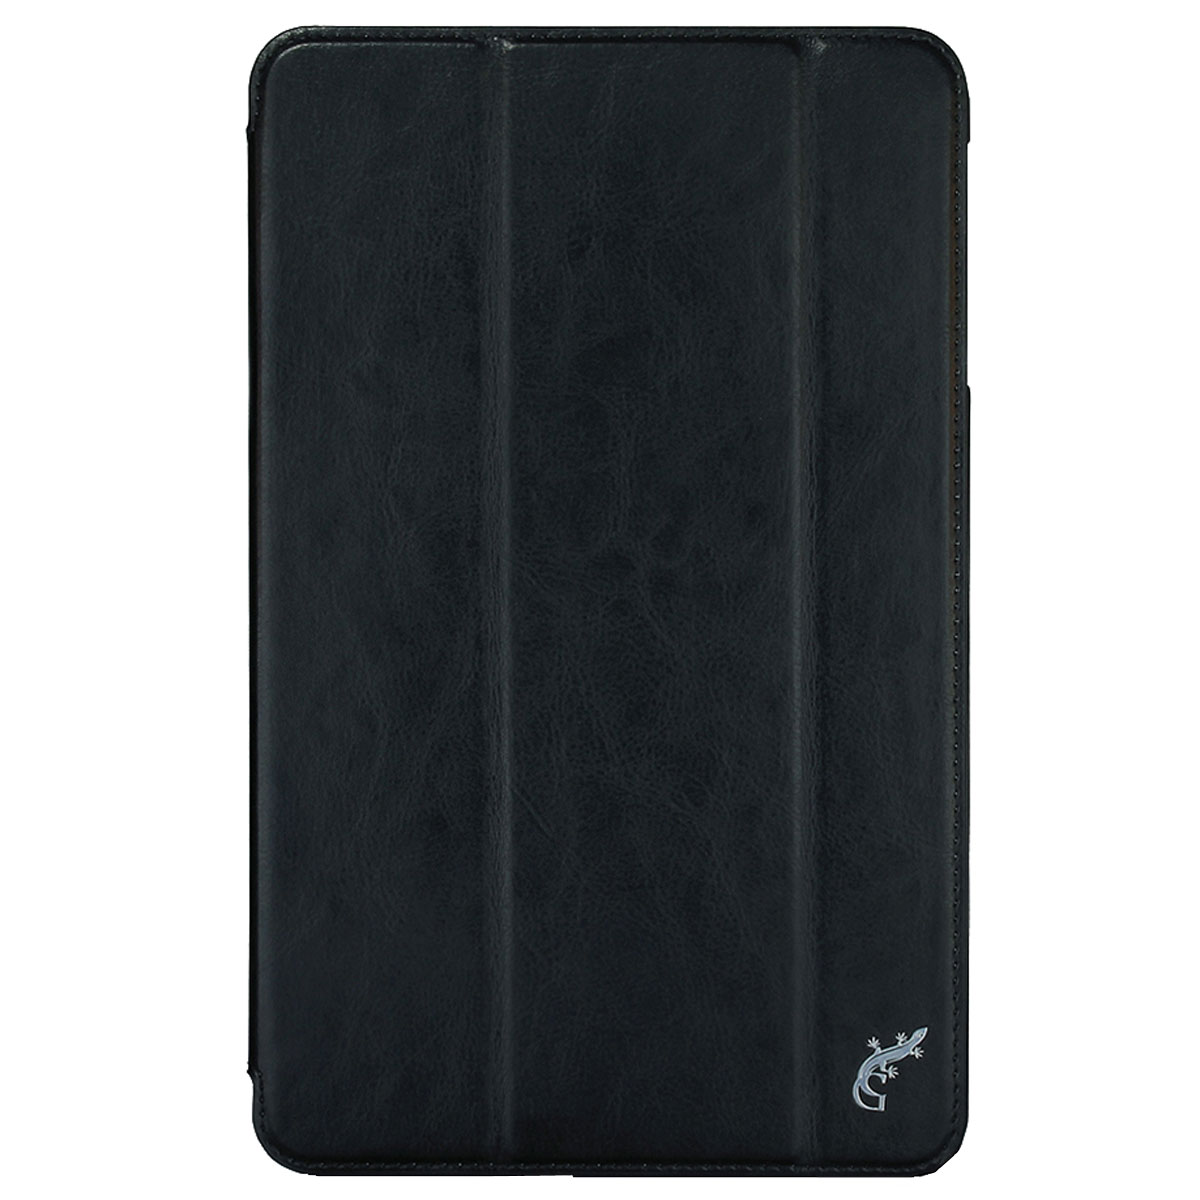 G-Case Slim Premium чехол для Samsung Galaxy Tab Е 9.6, Black